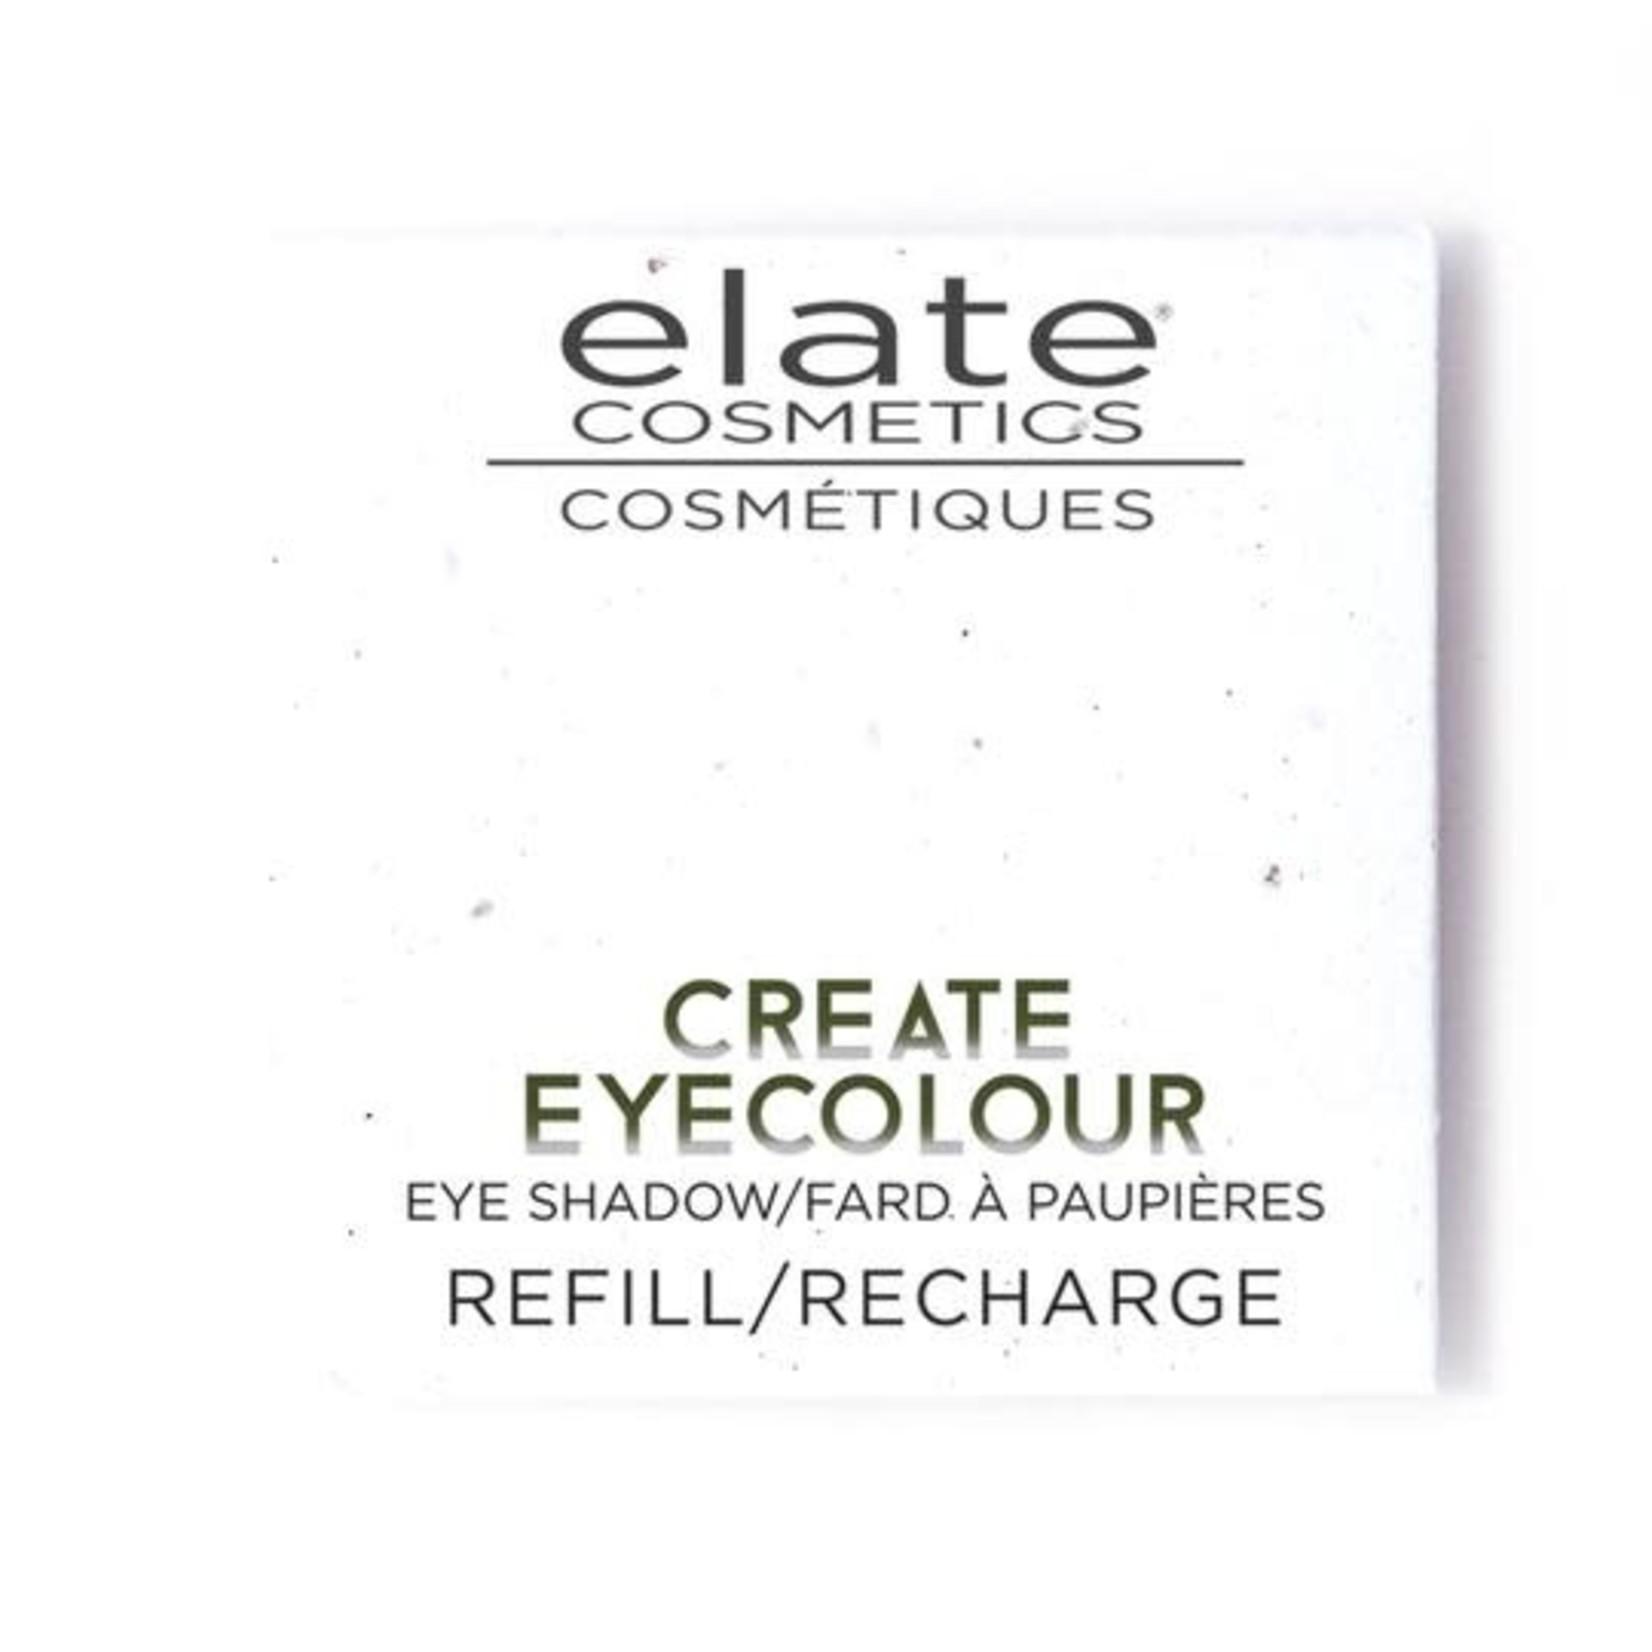 ELATE COSMETICS PRESSED EYECOLOUR - SOAR